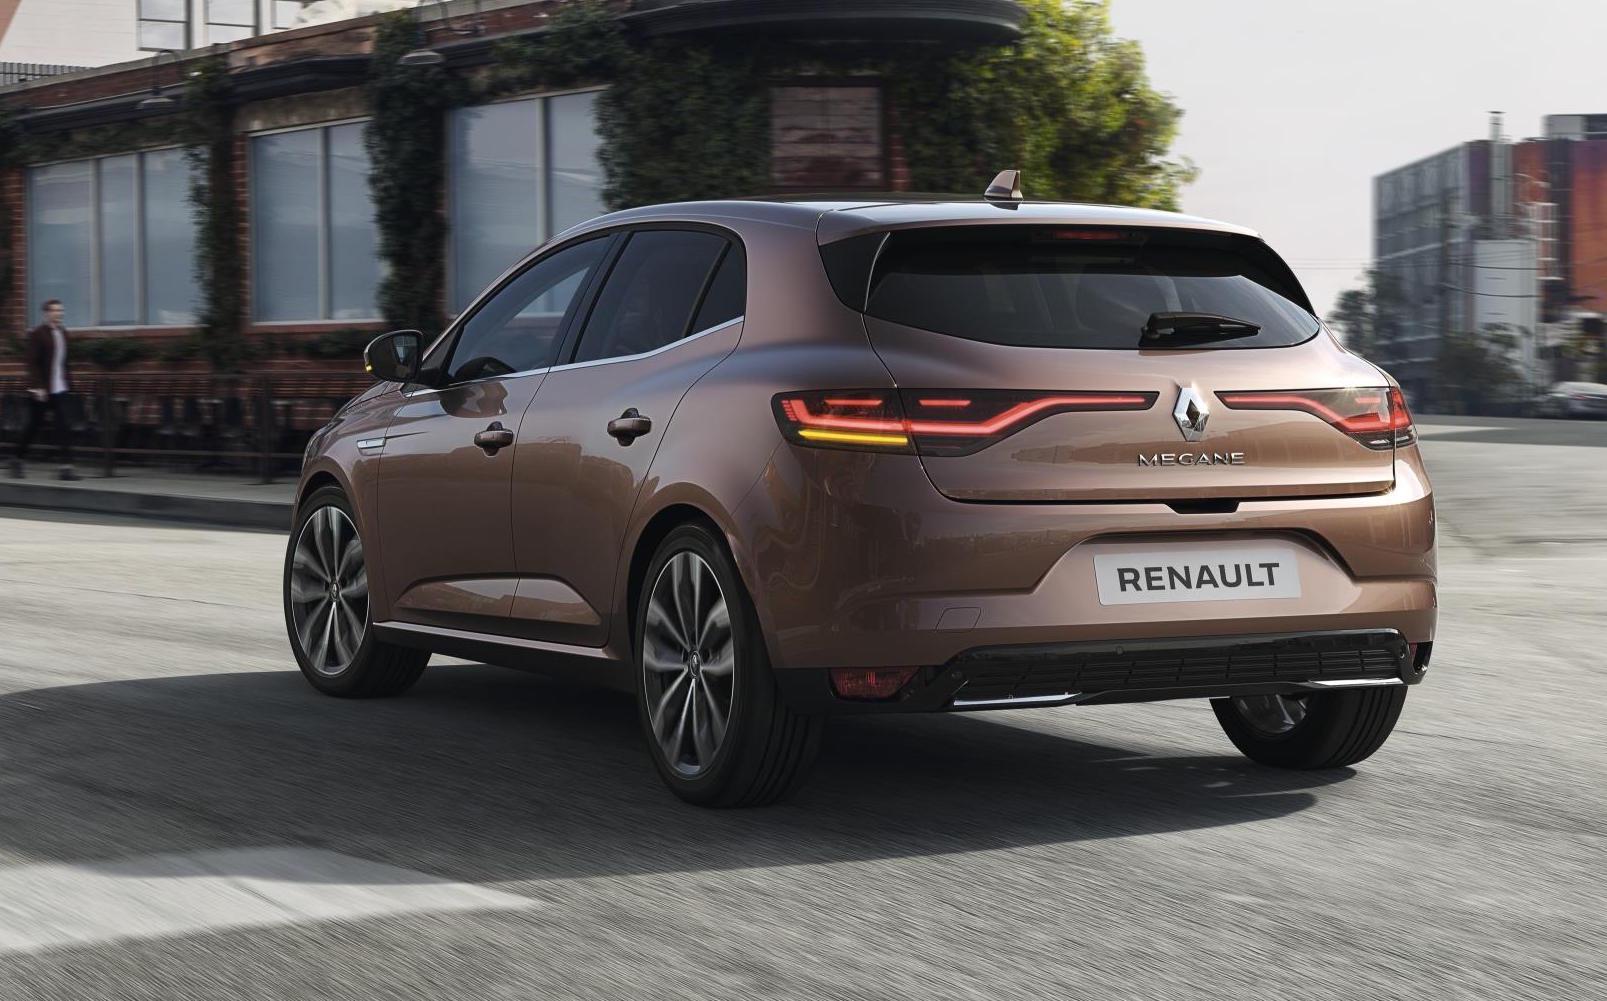 2020 Renault Megane Facelift Debuts Plug In Hybrid More Power For Rs Performancedrive